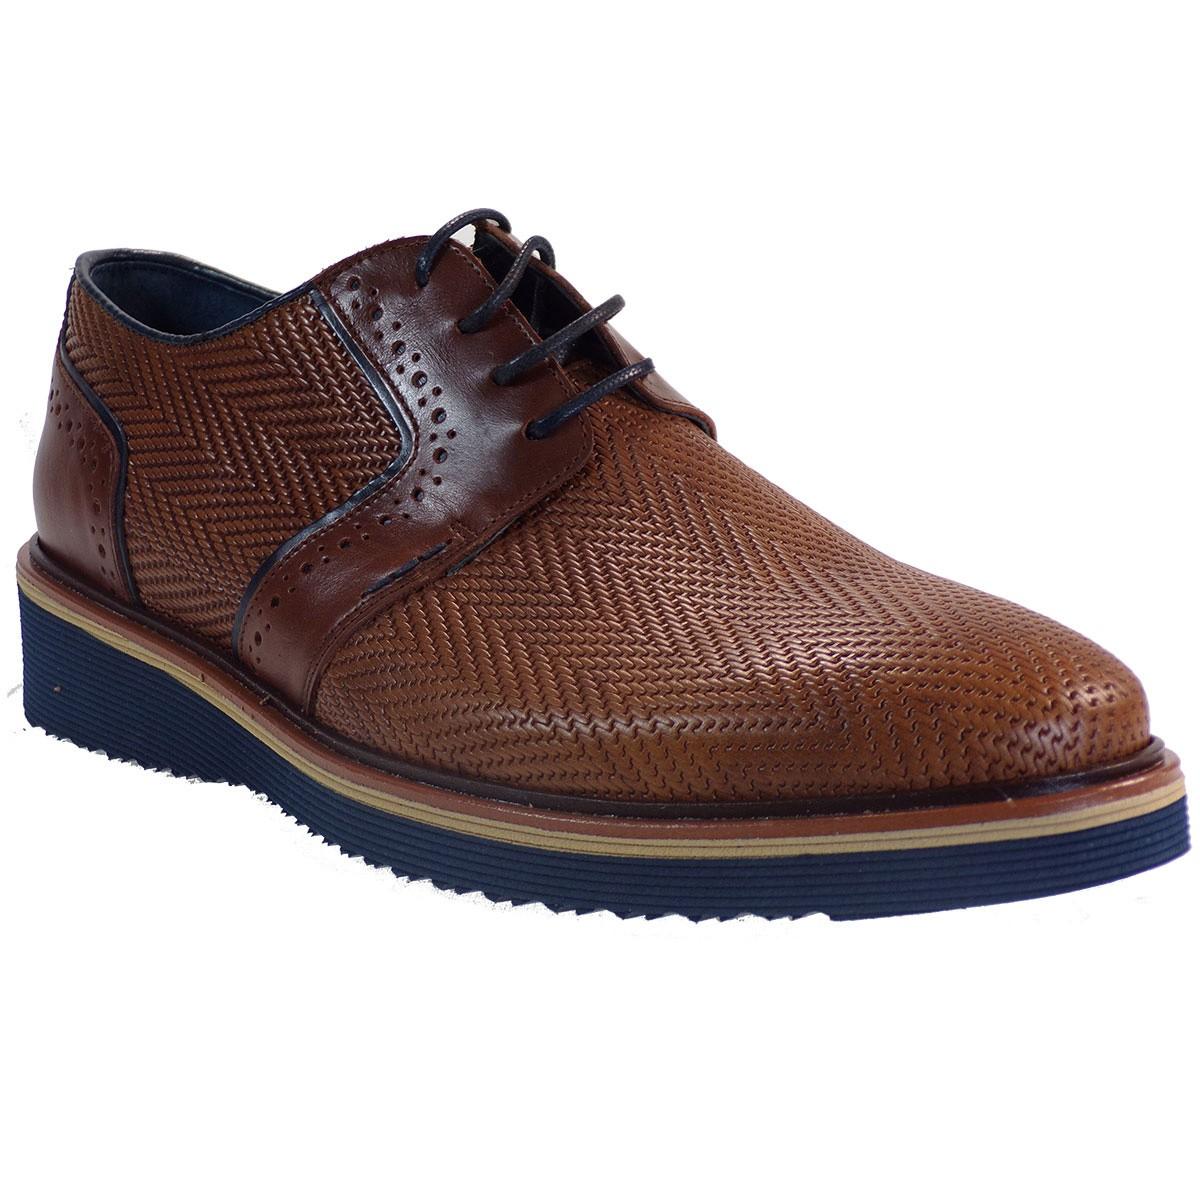 kricket Ανδρικά Παπούτσια 220 Ταμπά Δέρμα